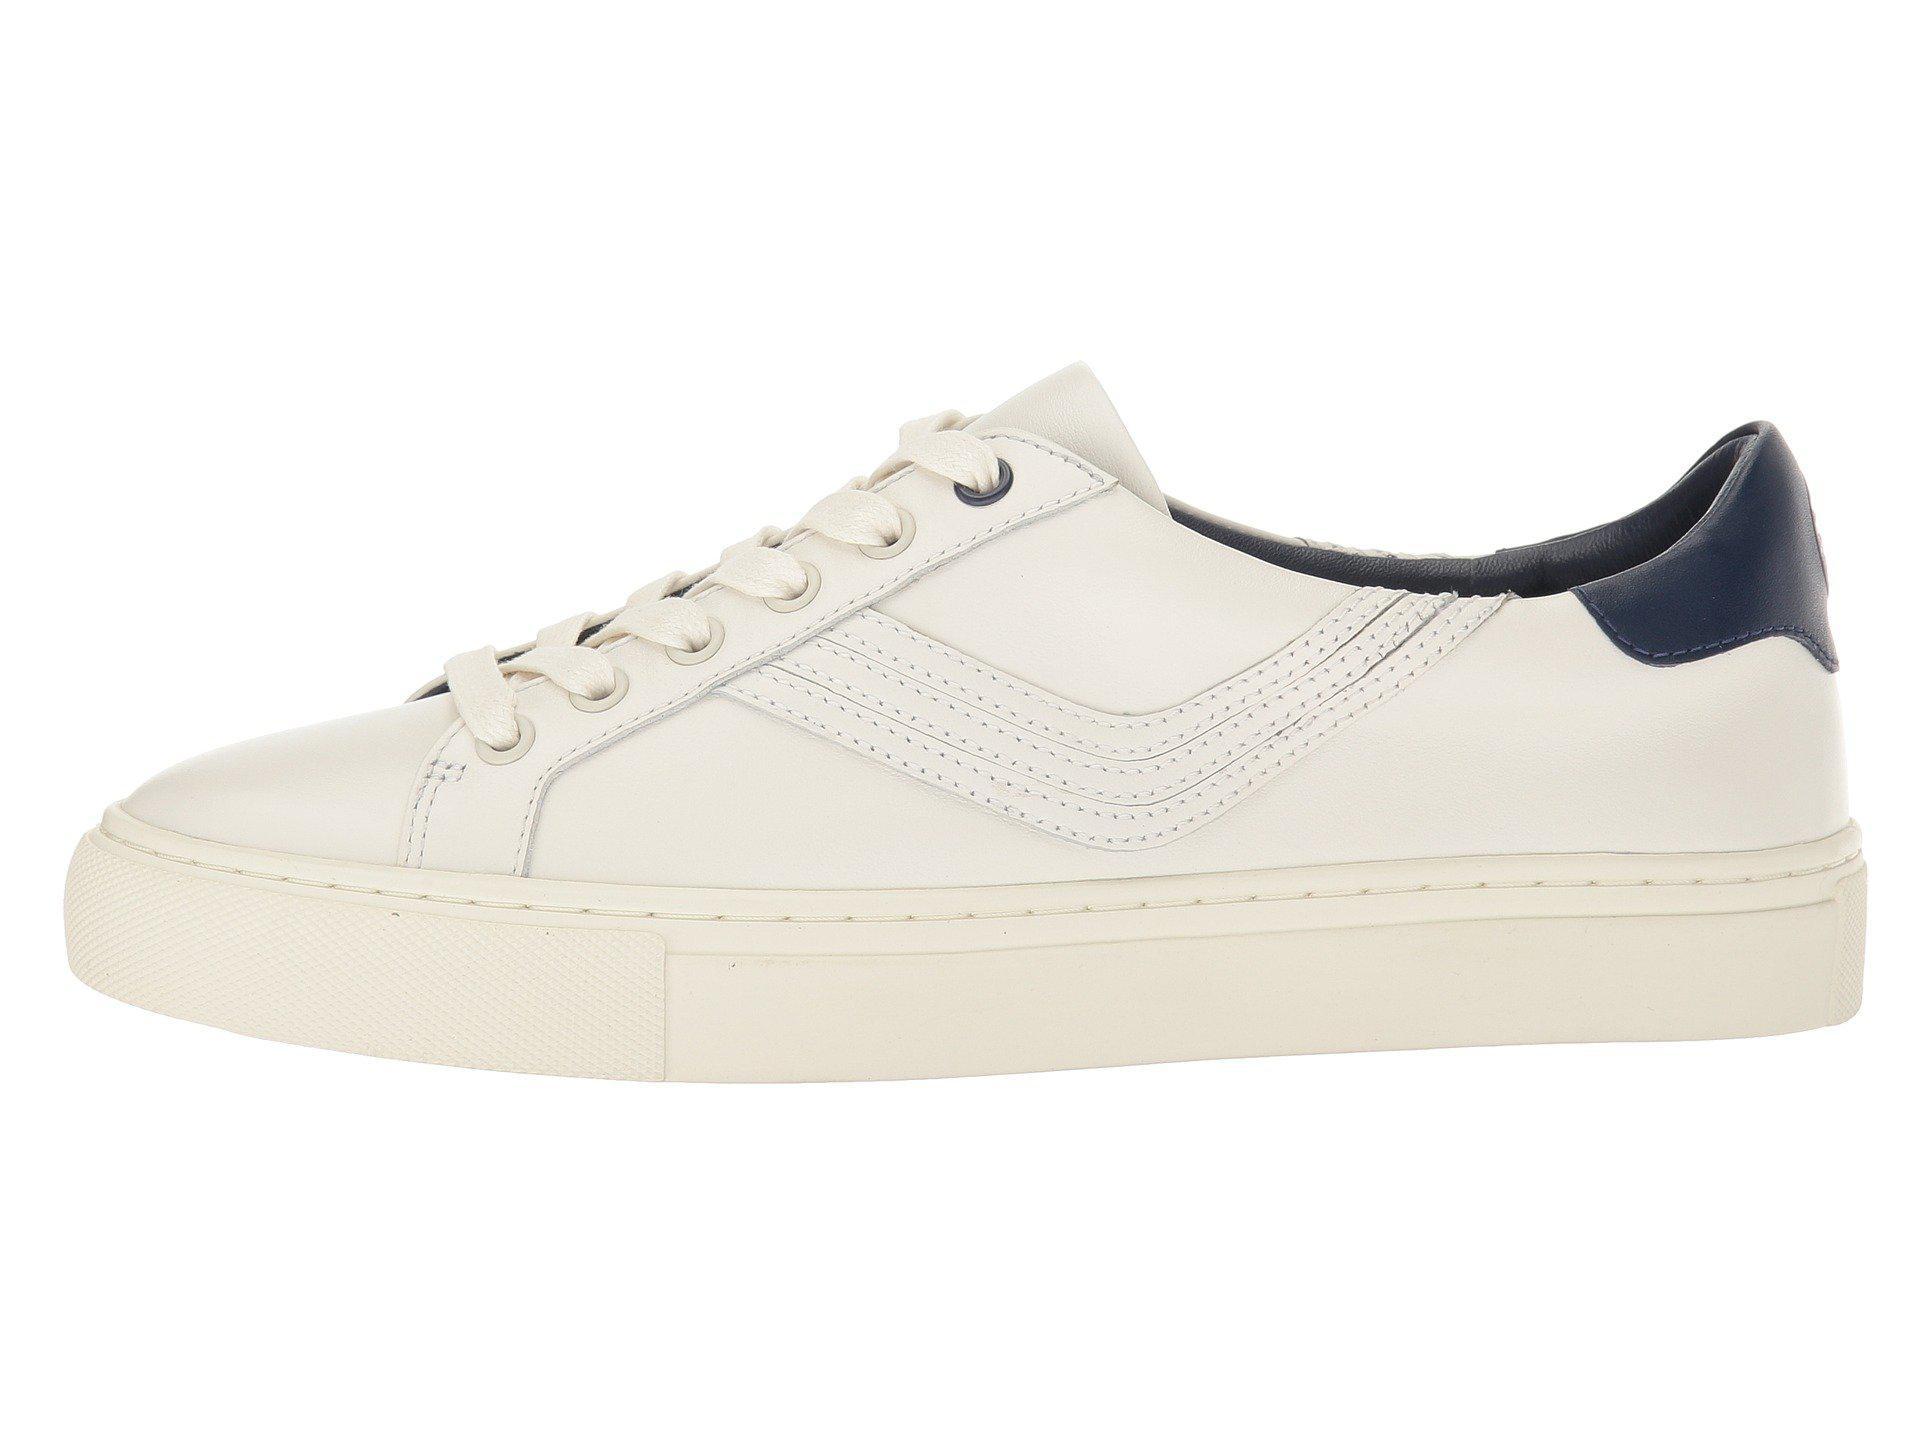 Tory Sport Leather Chevron Color Block Sneaker (snow White/navy Sea) Women's Shoes for Men - Lyst